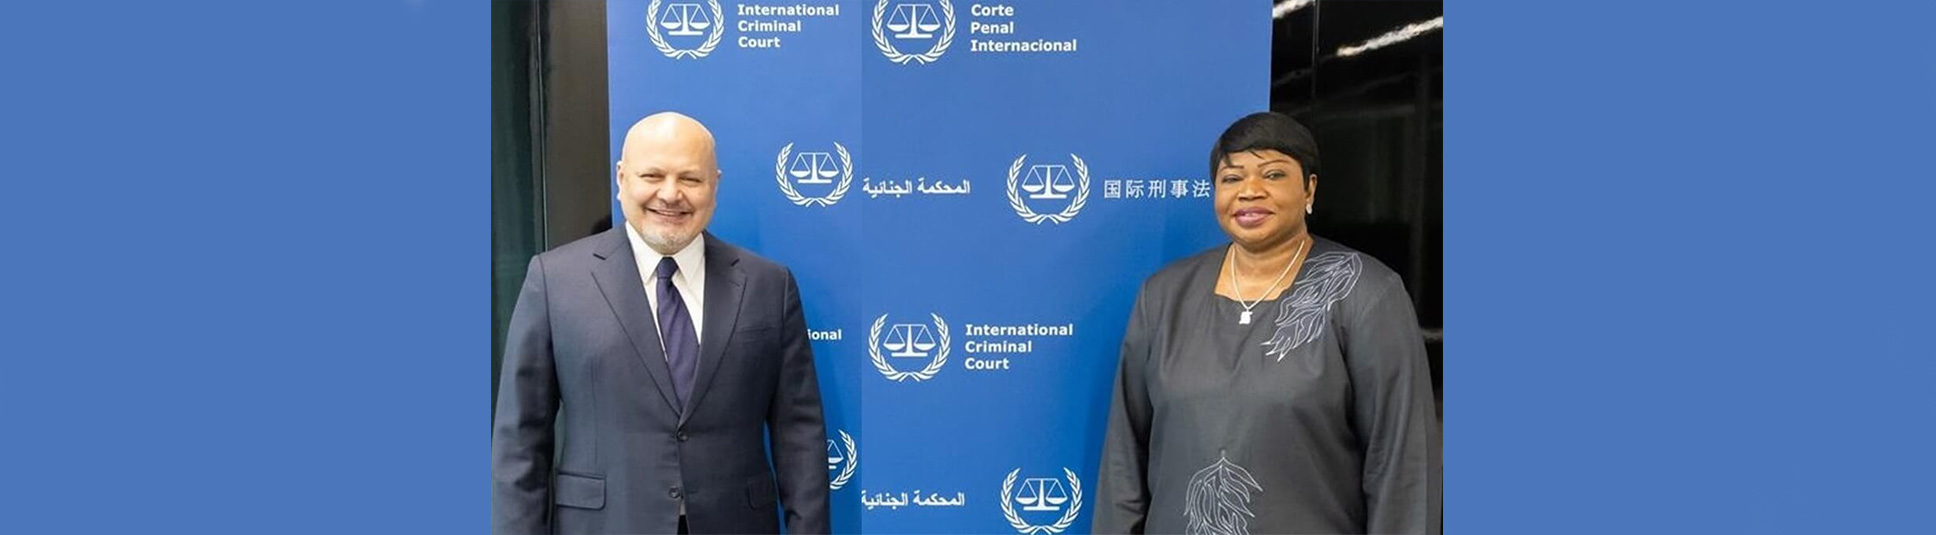 ICEJ: Karim Khan and Fatou Bensouda